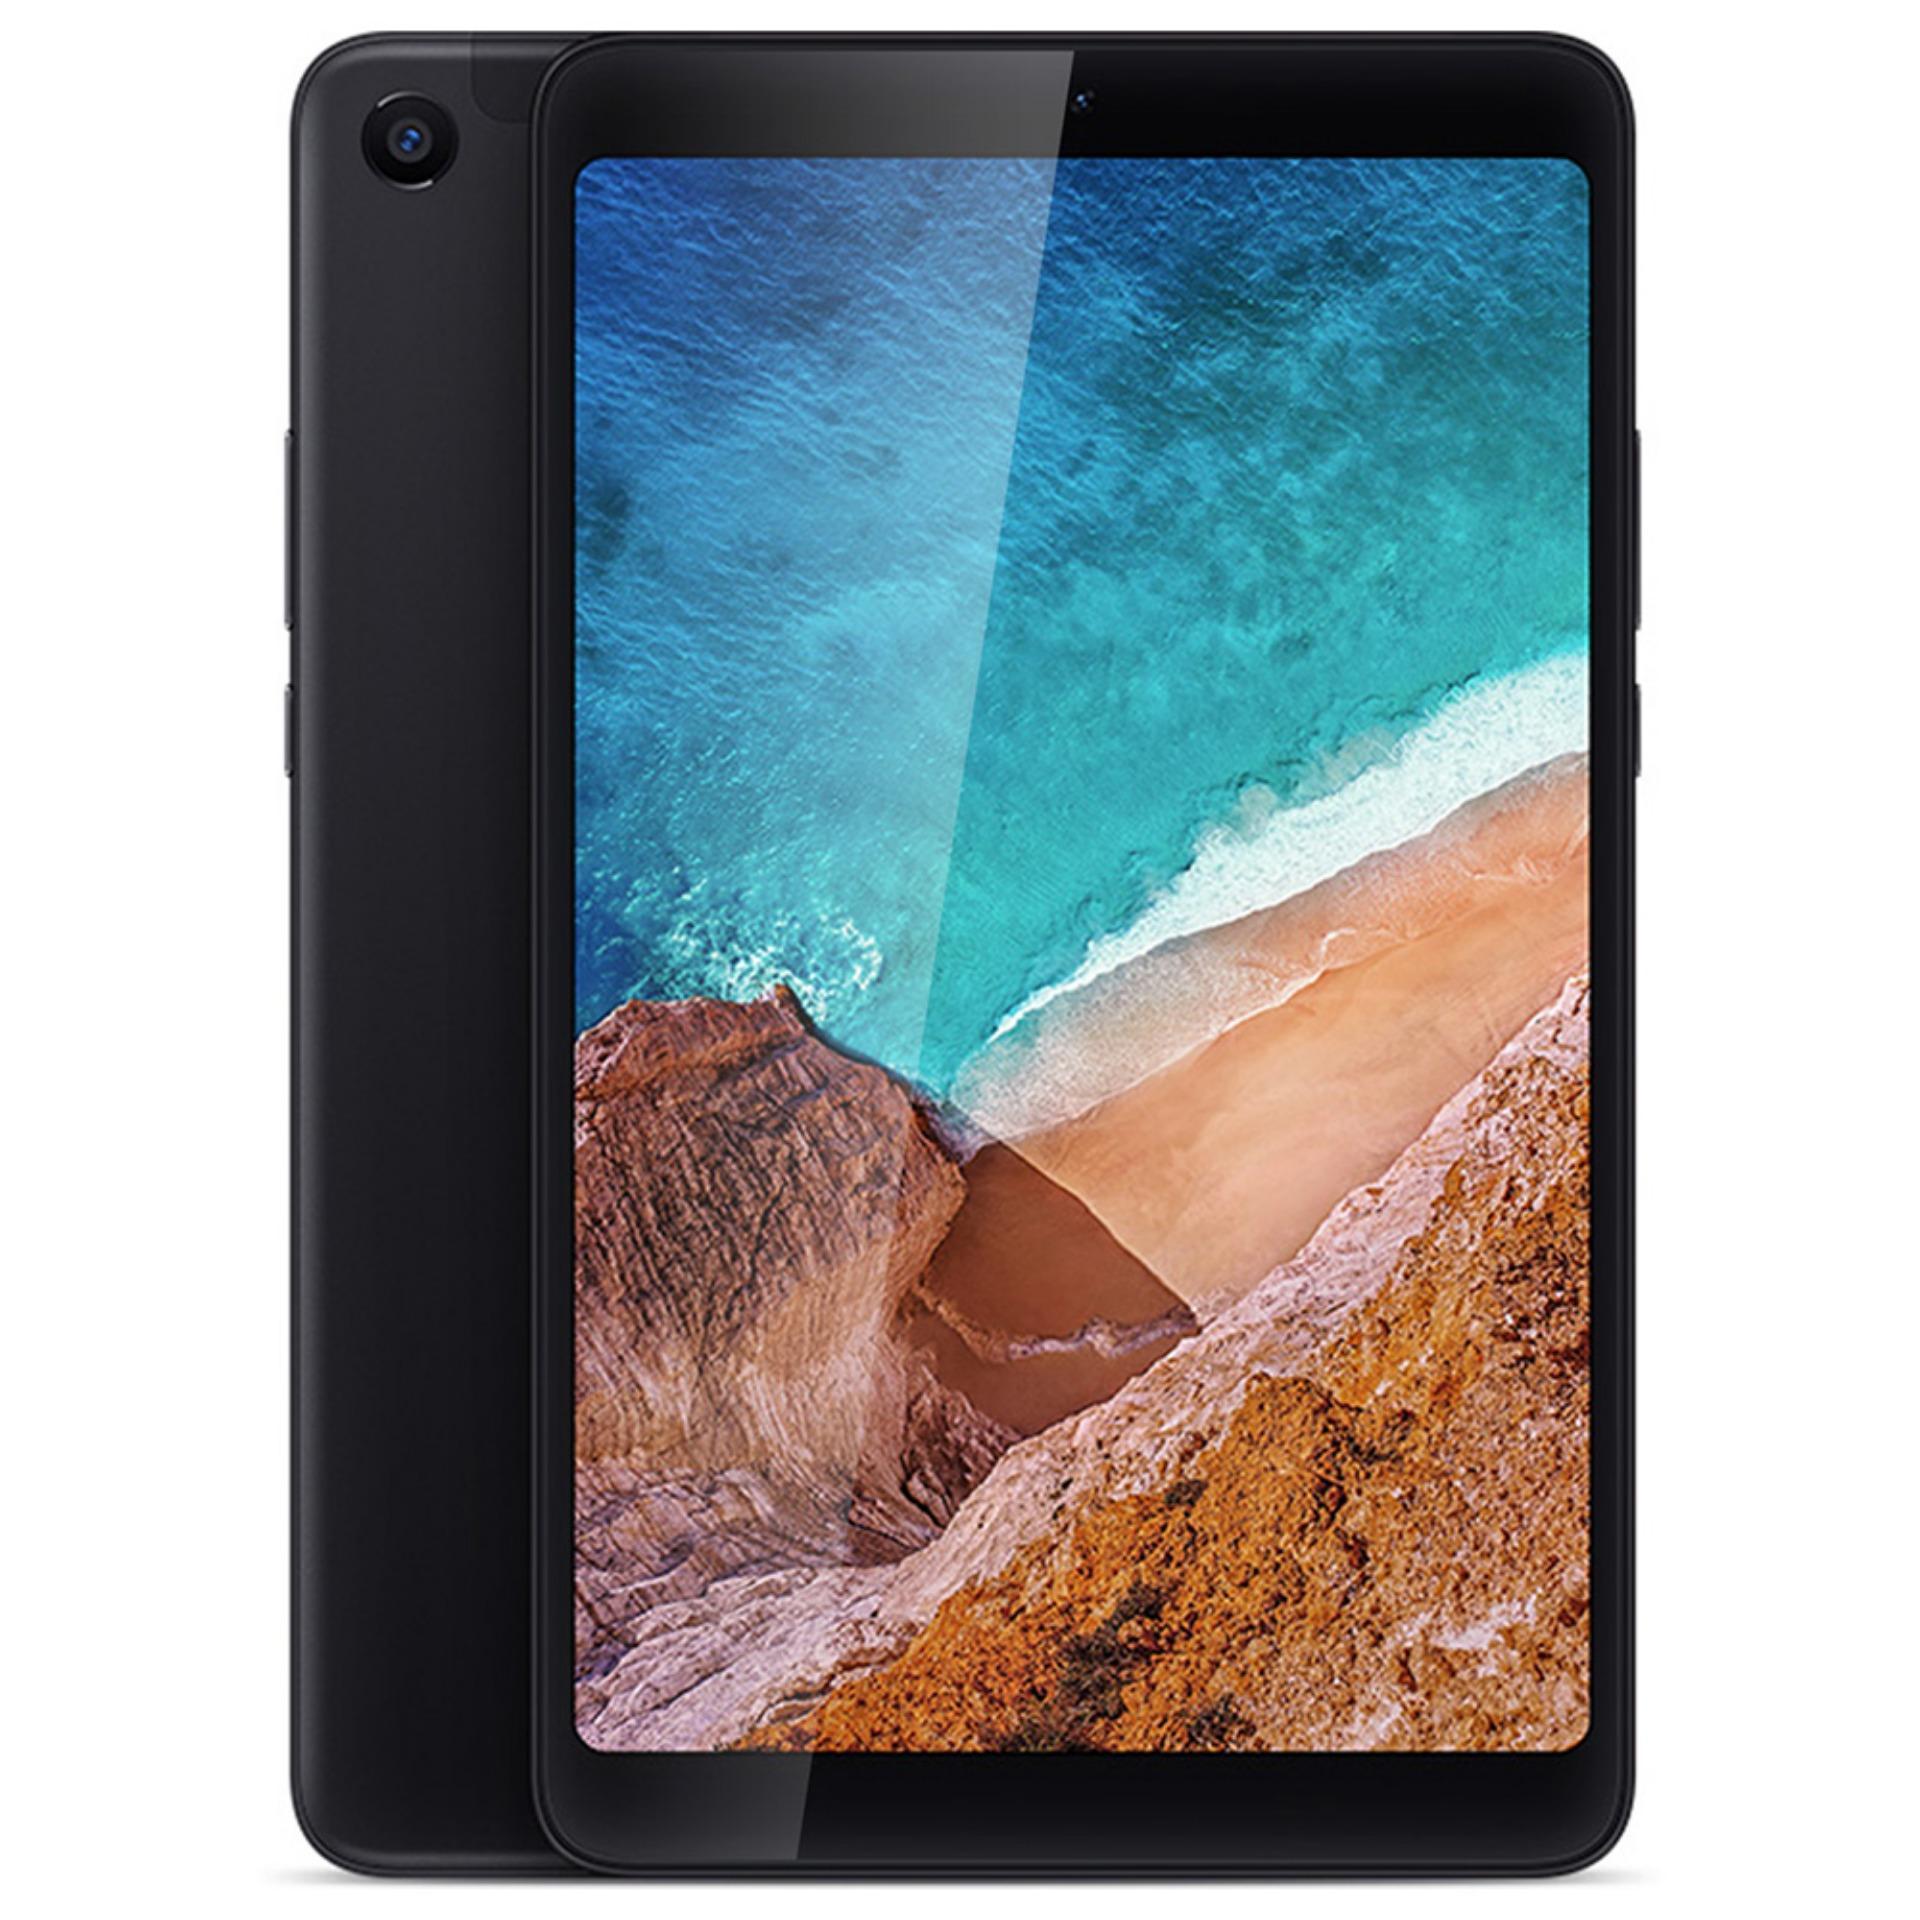 Original Global Version Xiaomi Mi Pad 4 4G Phablet 8.0 inch MIUI 9 Qualcomm Snapdragon 660 Octa Core 4GB RAM 64GB eMMC ROM 5.0MP + 13.0MP Front Rear Cameras Dual WiFi